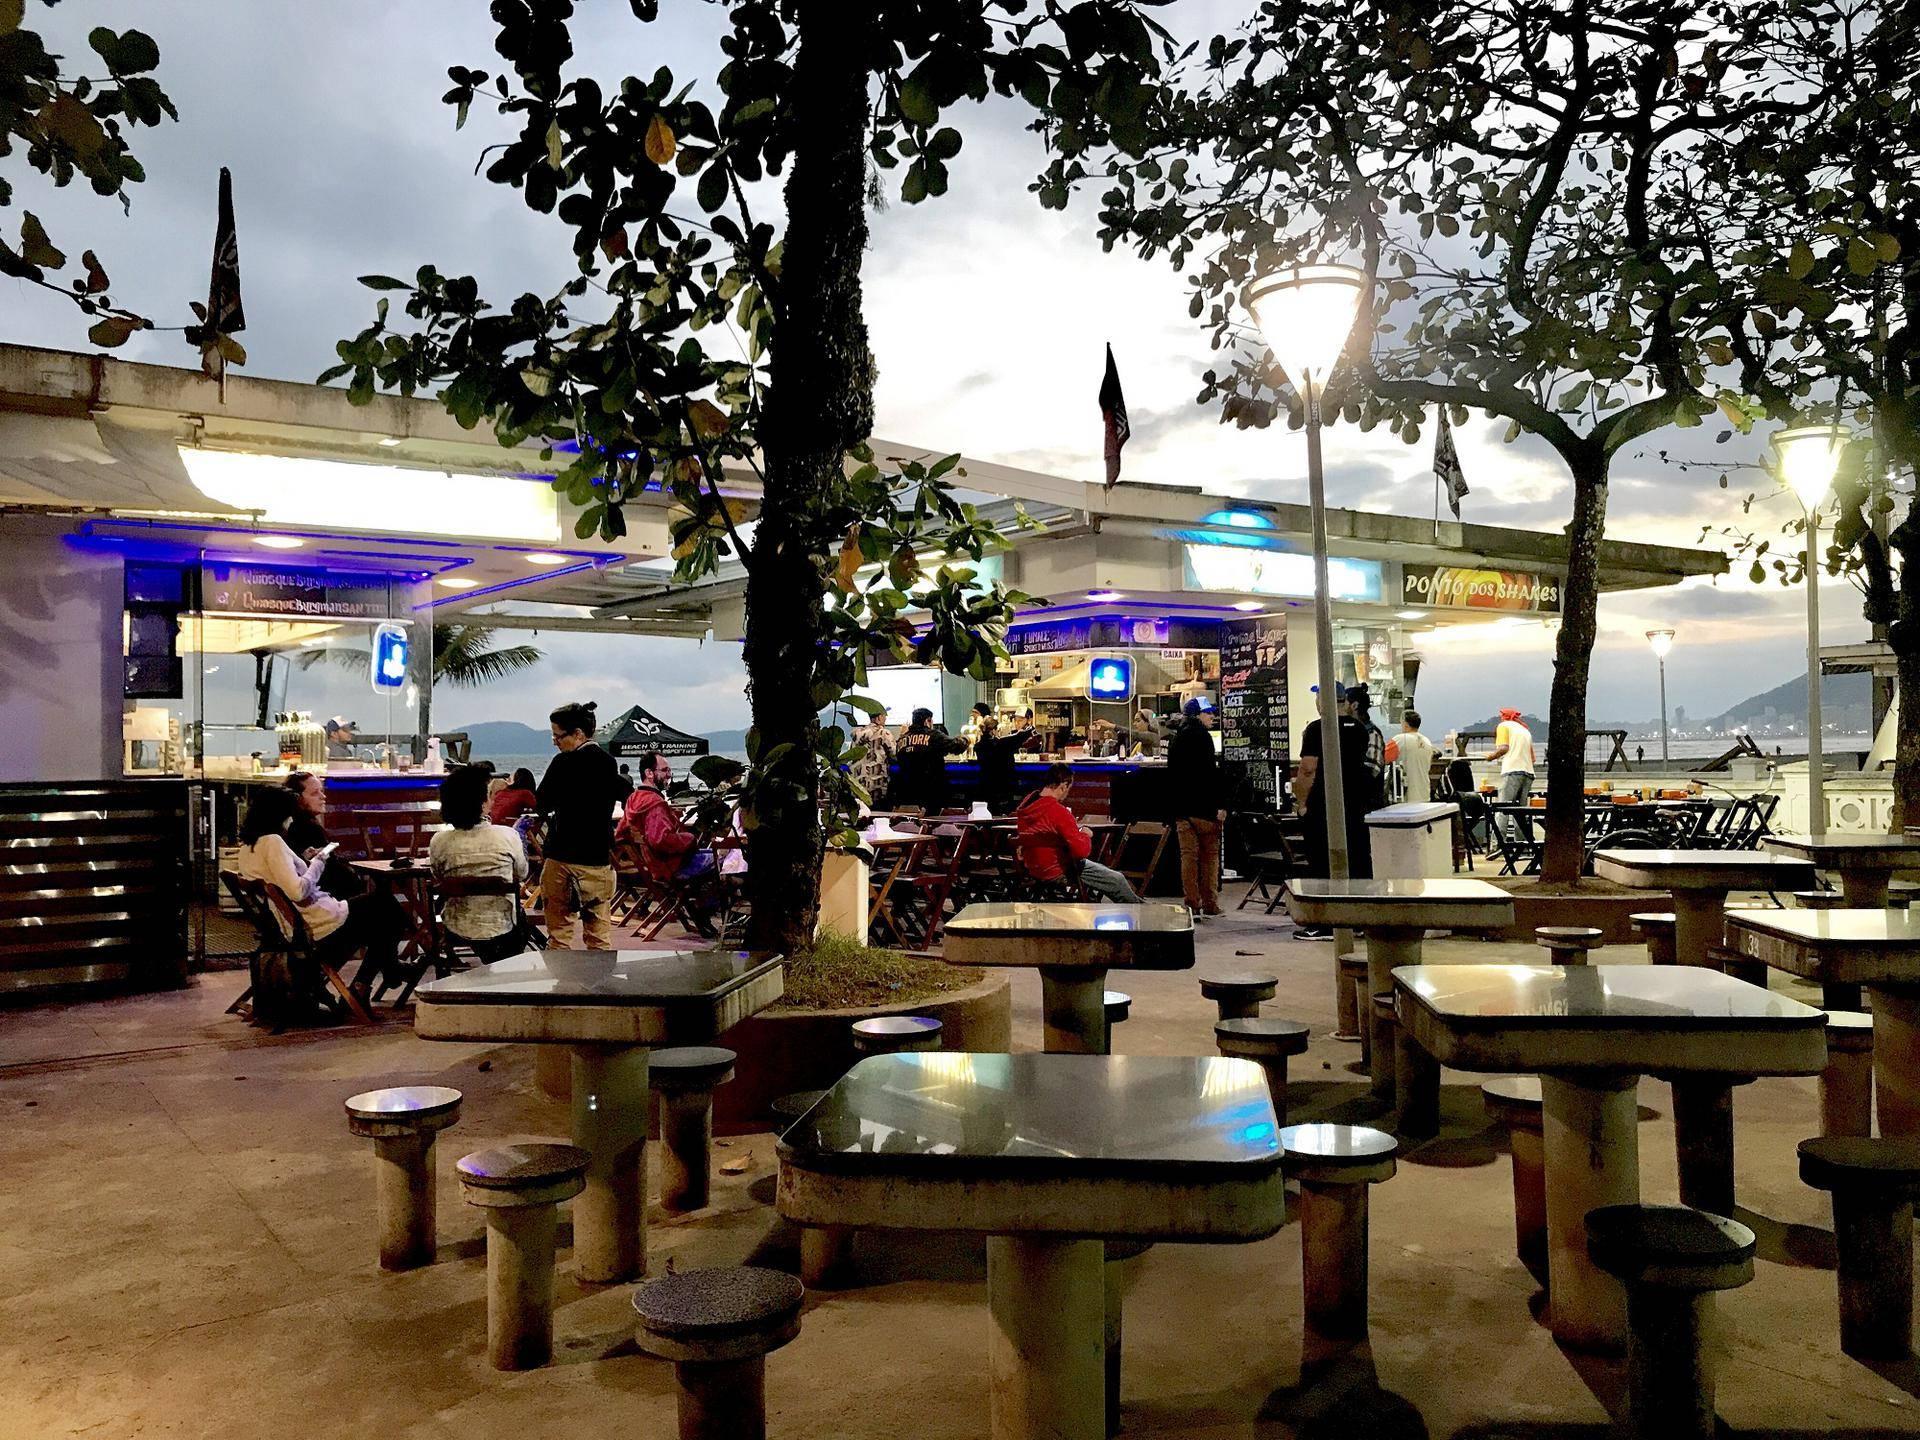 www.juicysantos.com.br - quiosque na praia burgman cerveja artesanal